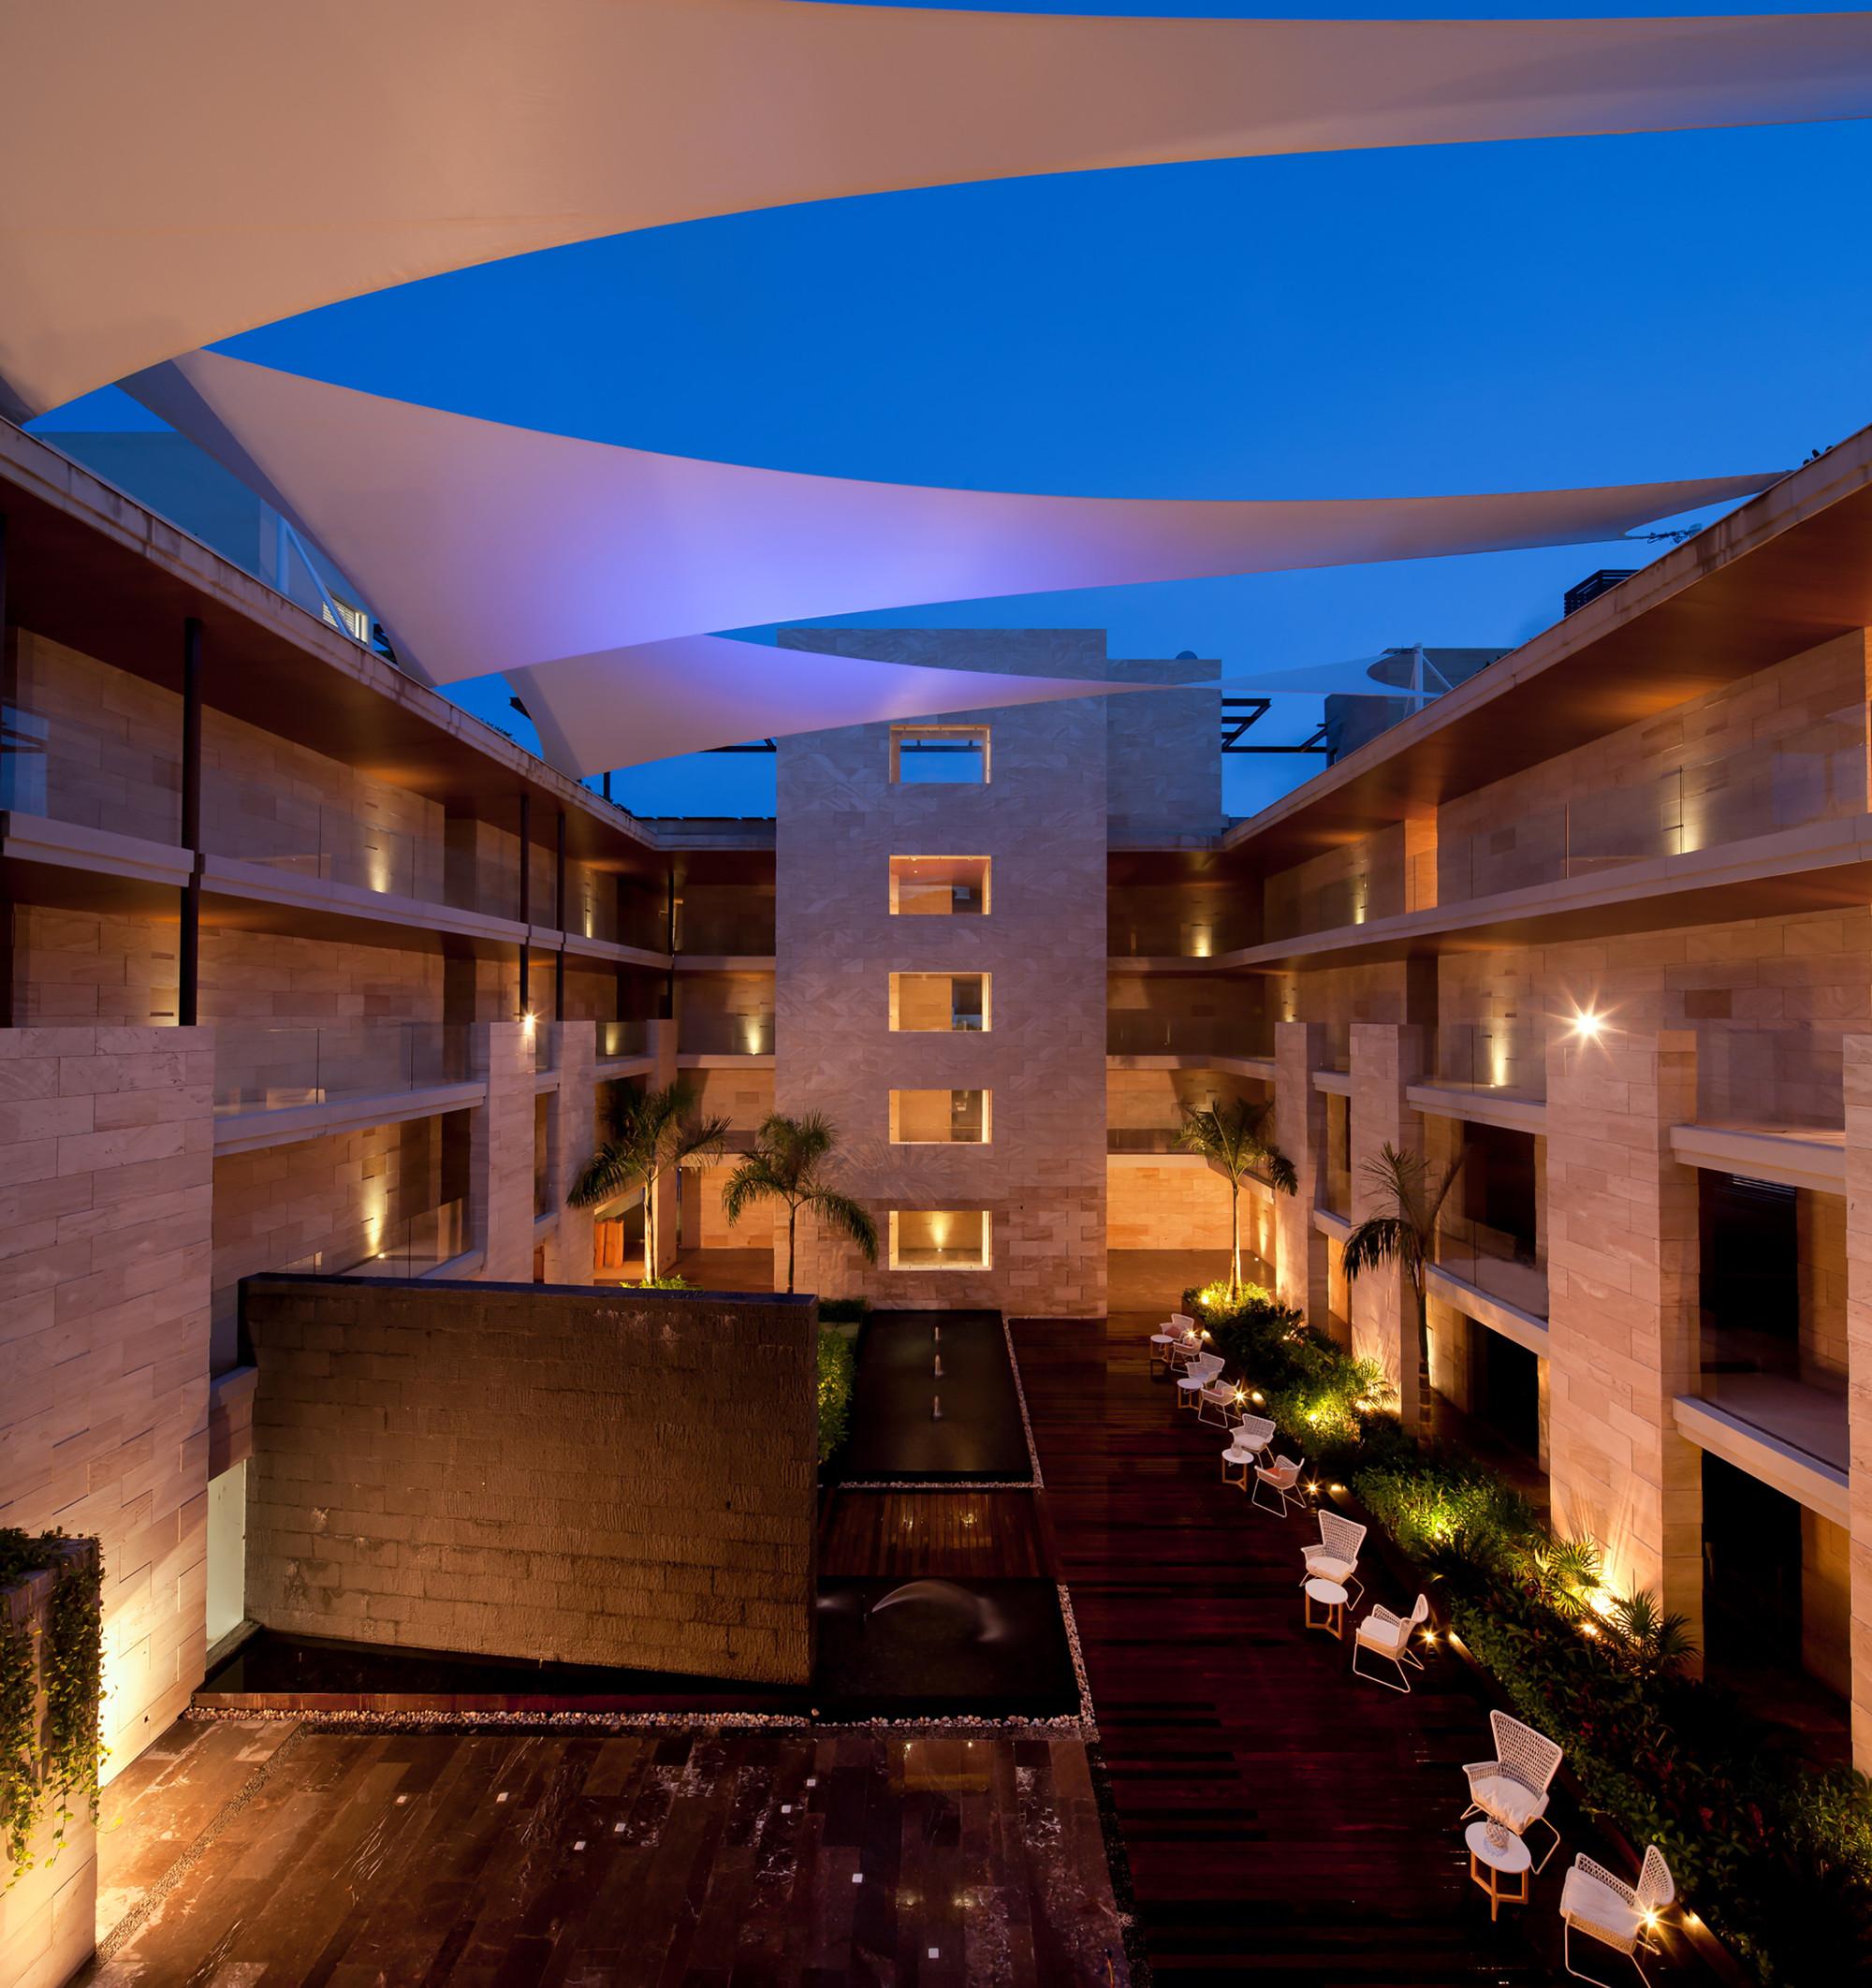 Galer a de hotel boutique cacao rdlp arquitectos 3 for Boutique hotel minorque